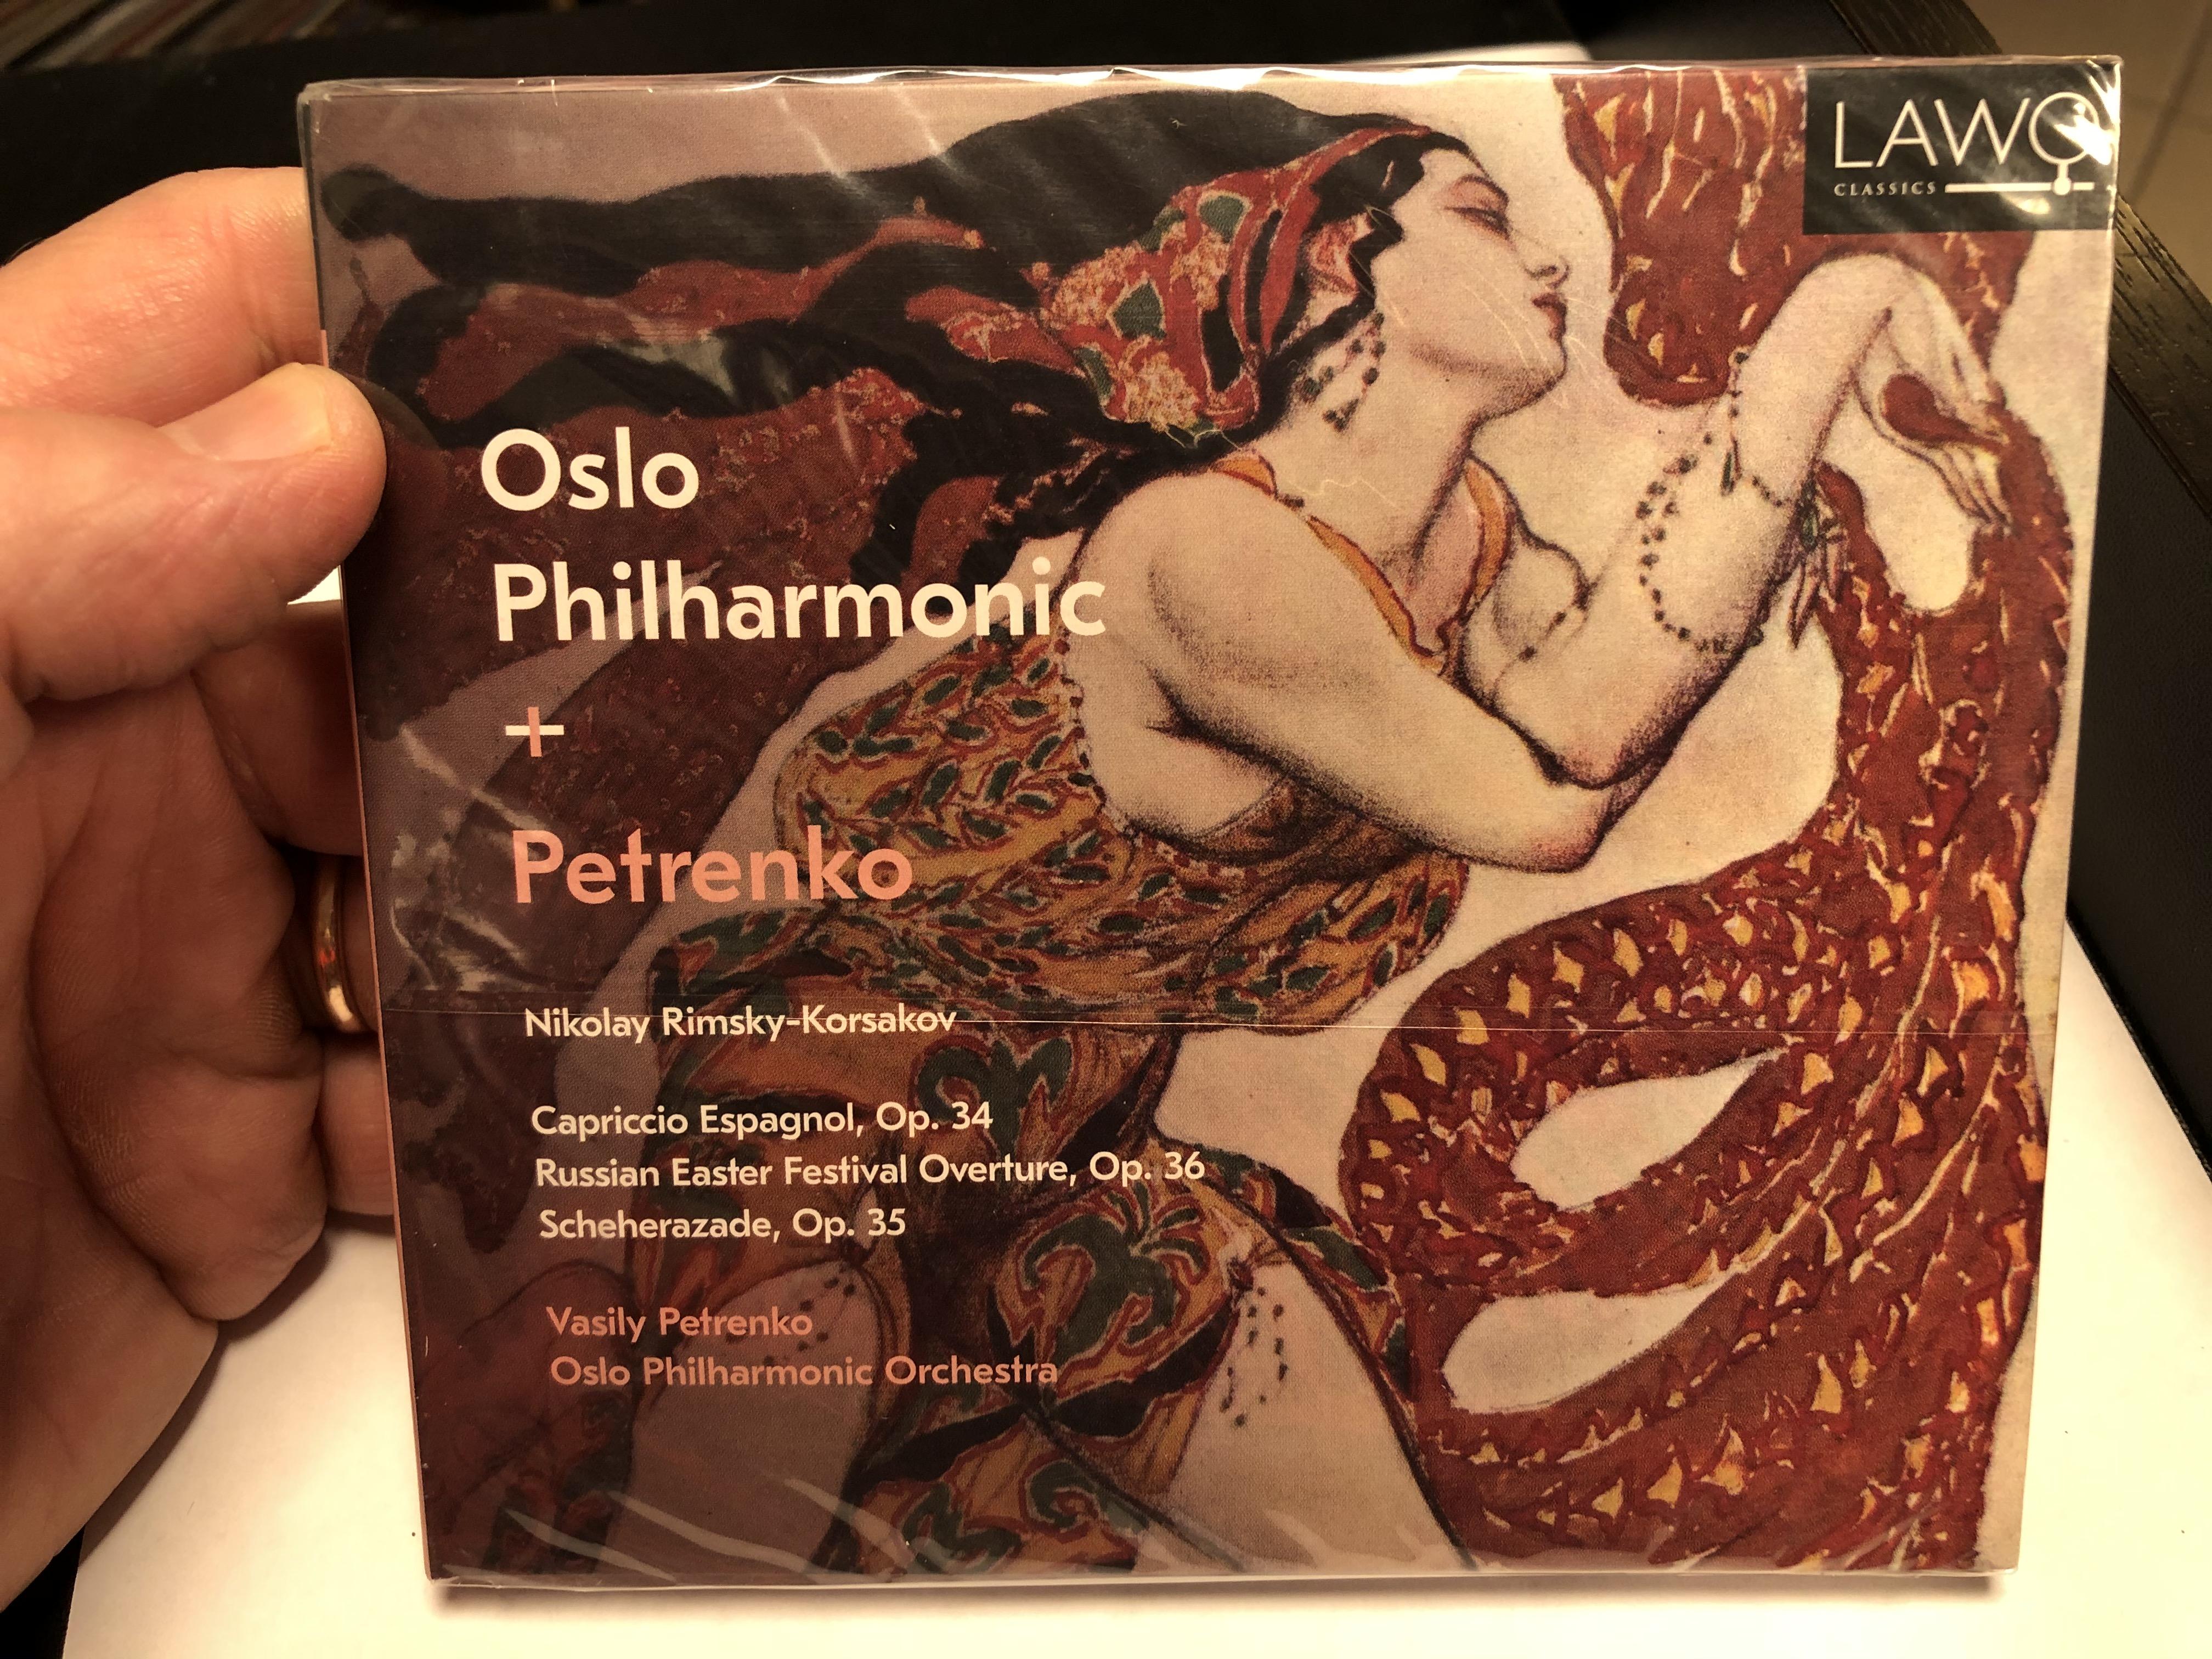 oslo-philharmonic-petrenko-nikolay-rimsky-korsakov-capriccio-espagnol-op.-34-russian-easter-festival-overture-op.-36-scheherazade-op.-35-vasily-petrenko-oslo-philharmonic-orchestr-1-.jpg